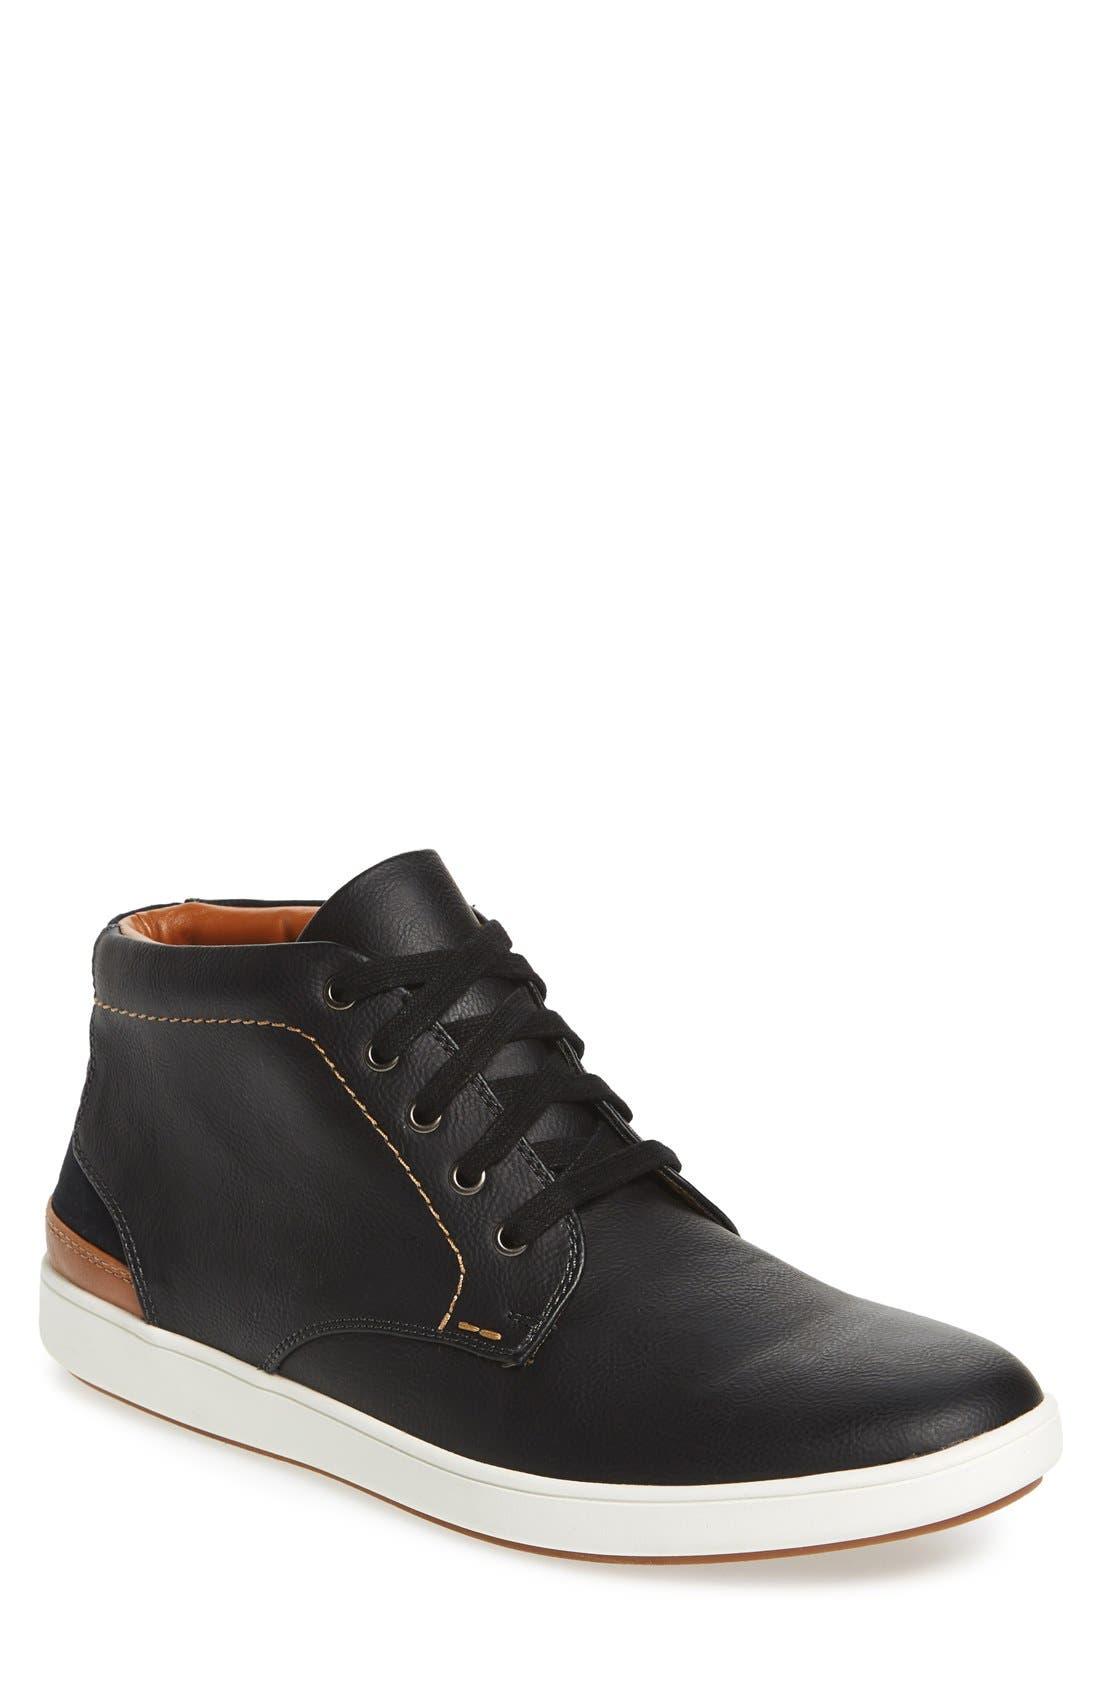 Freedomm Sneaker,                             Main thumbnail 1, color,                             017